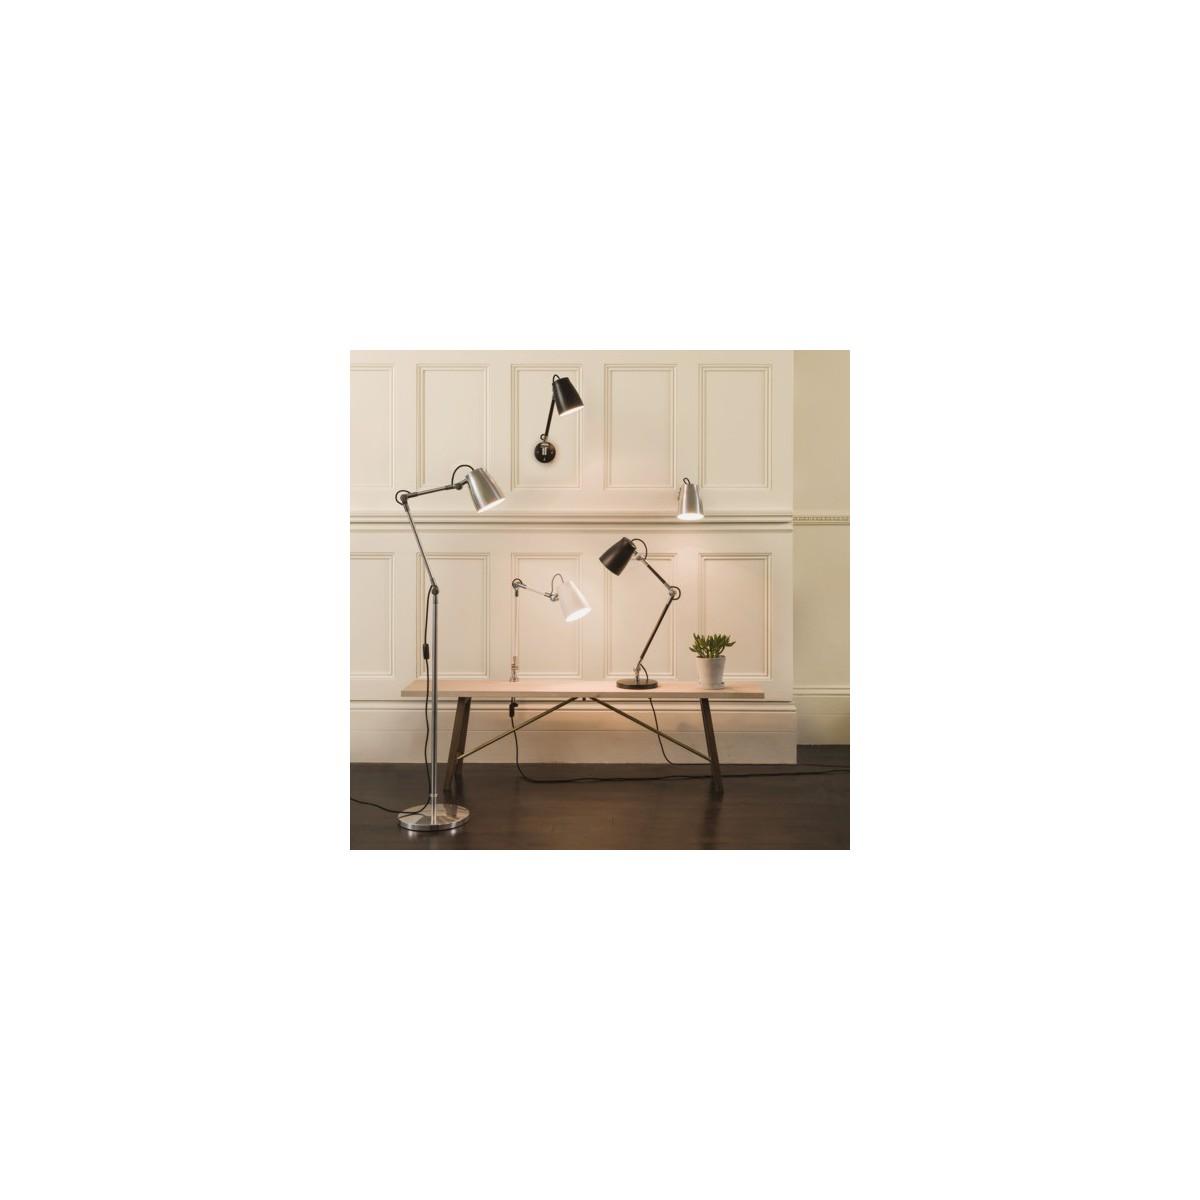 Astro Atelier Grande Do Czytania 1x28W Max E27 Polerowane Aluminium 1224014